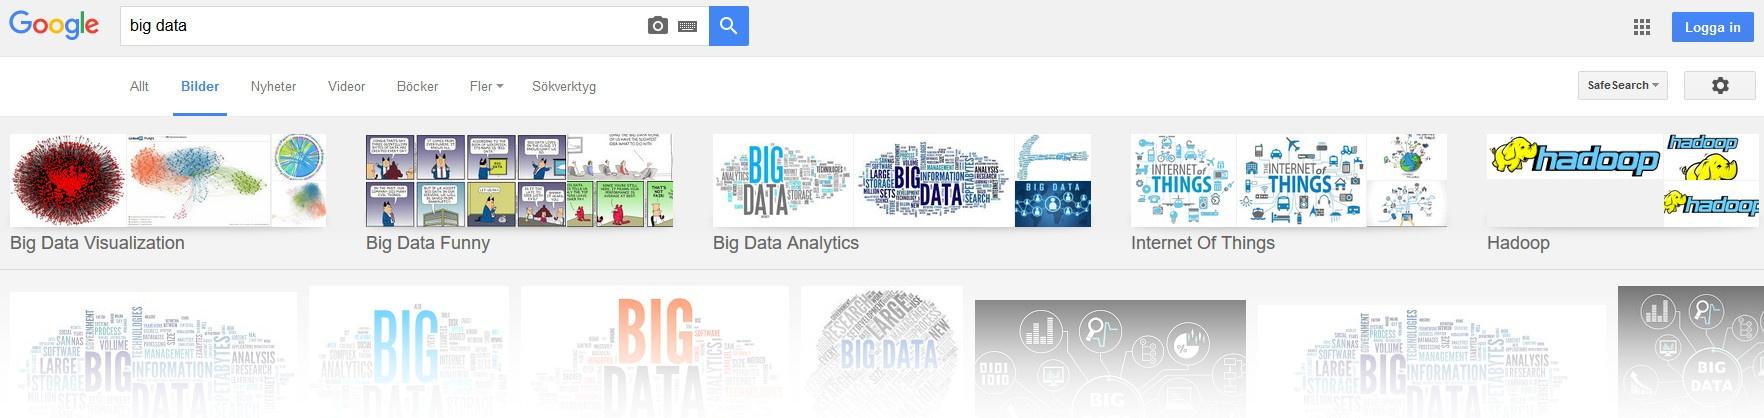 google search big data